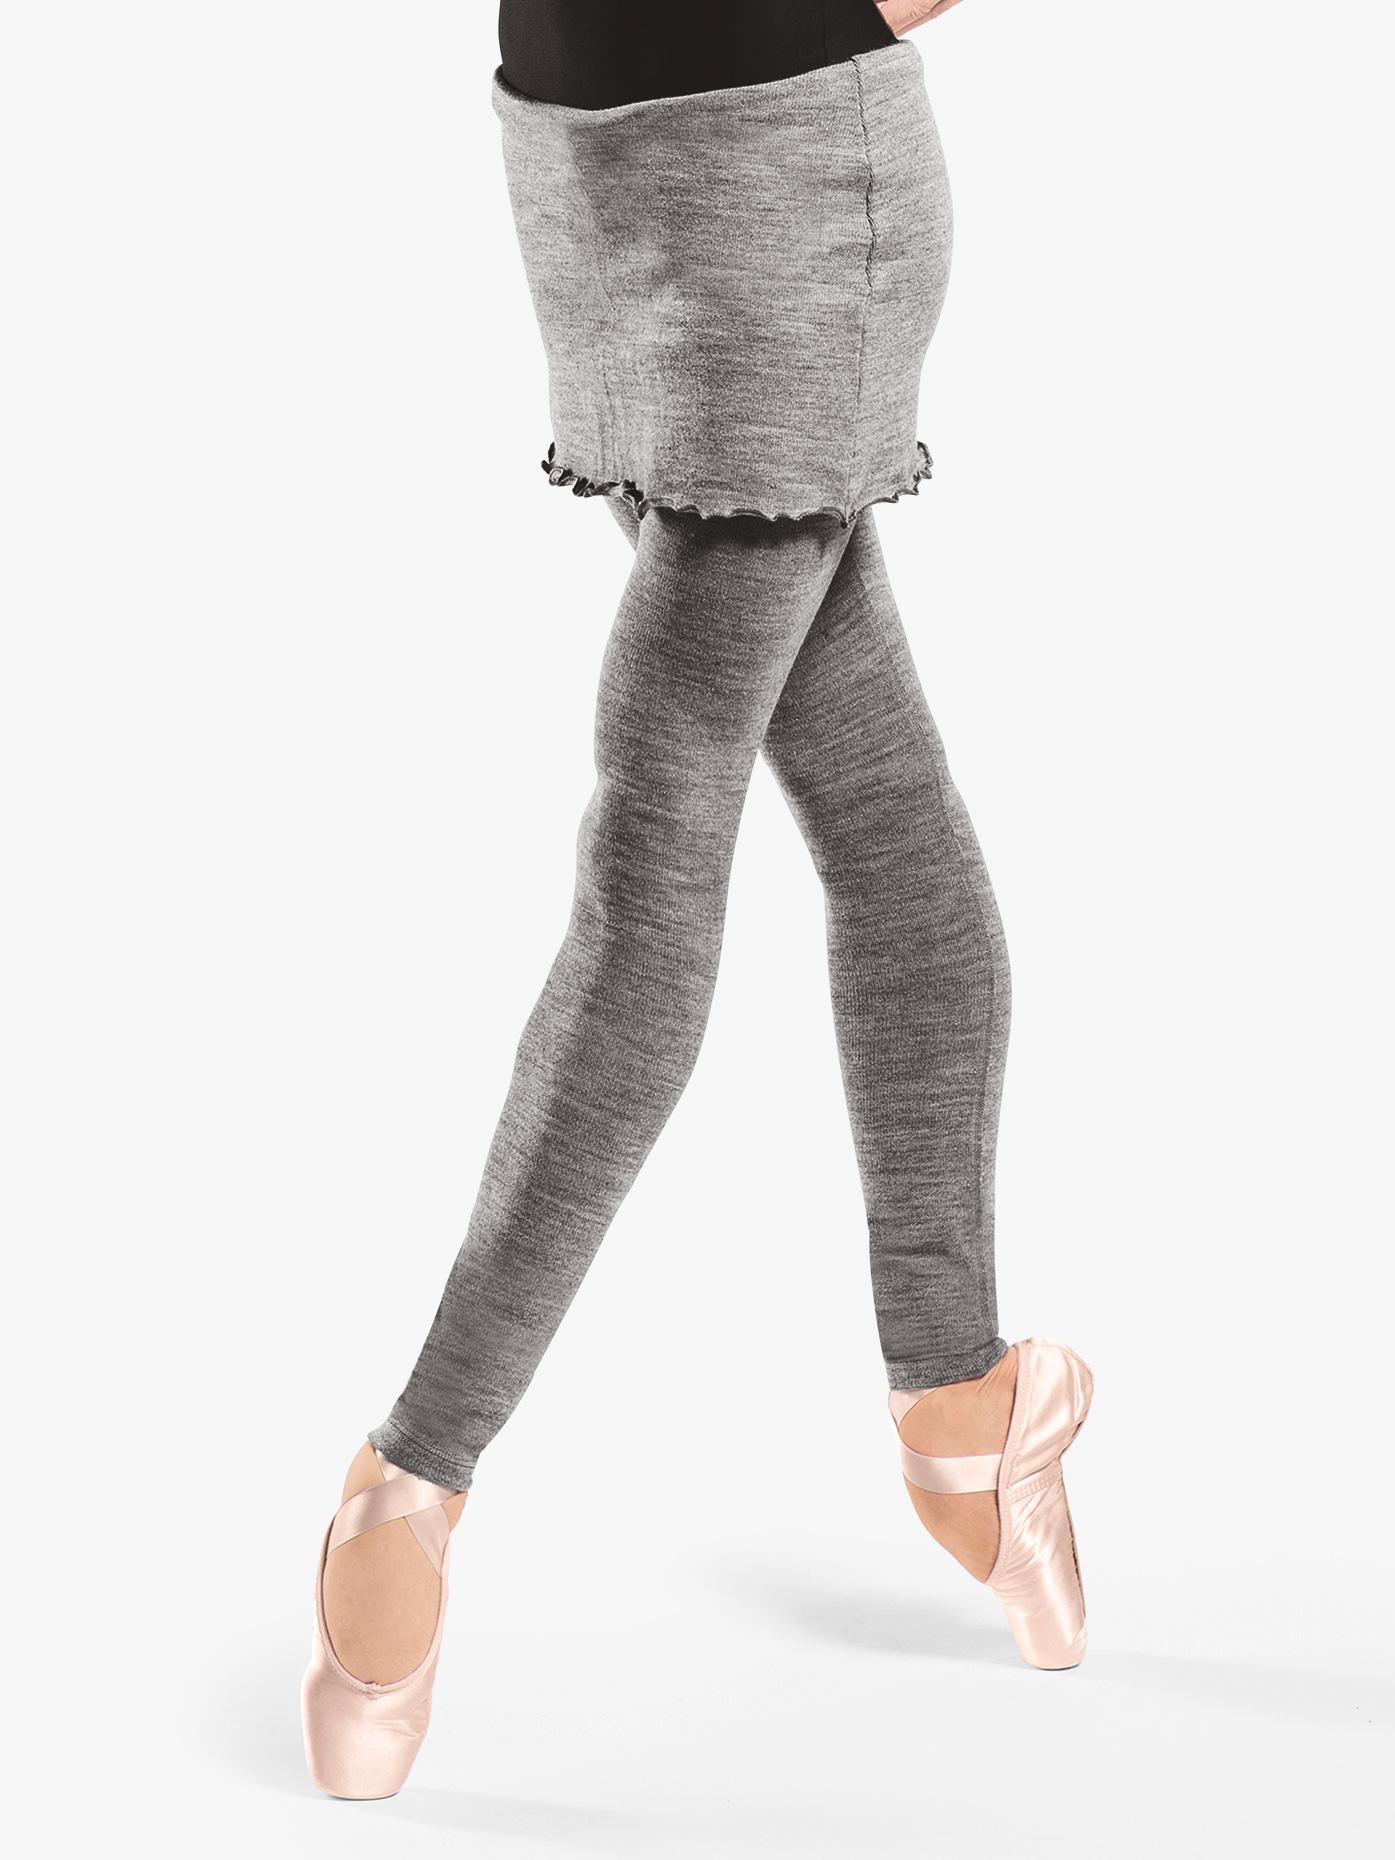 Wear Moi Adult Crysalide Sweater Warm-Up Tights WM177